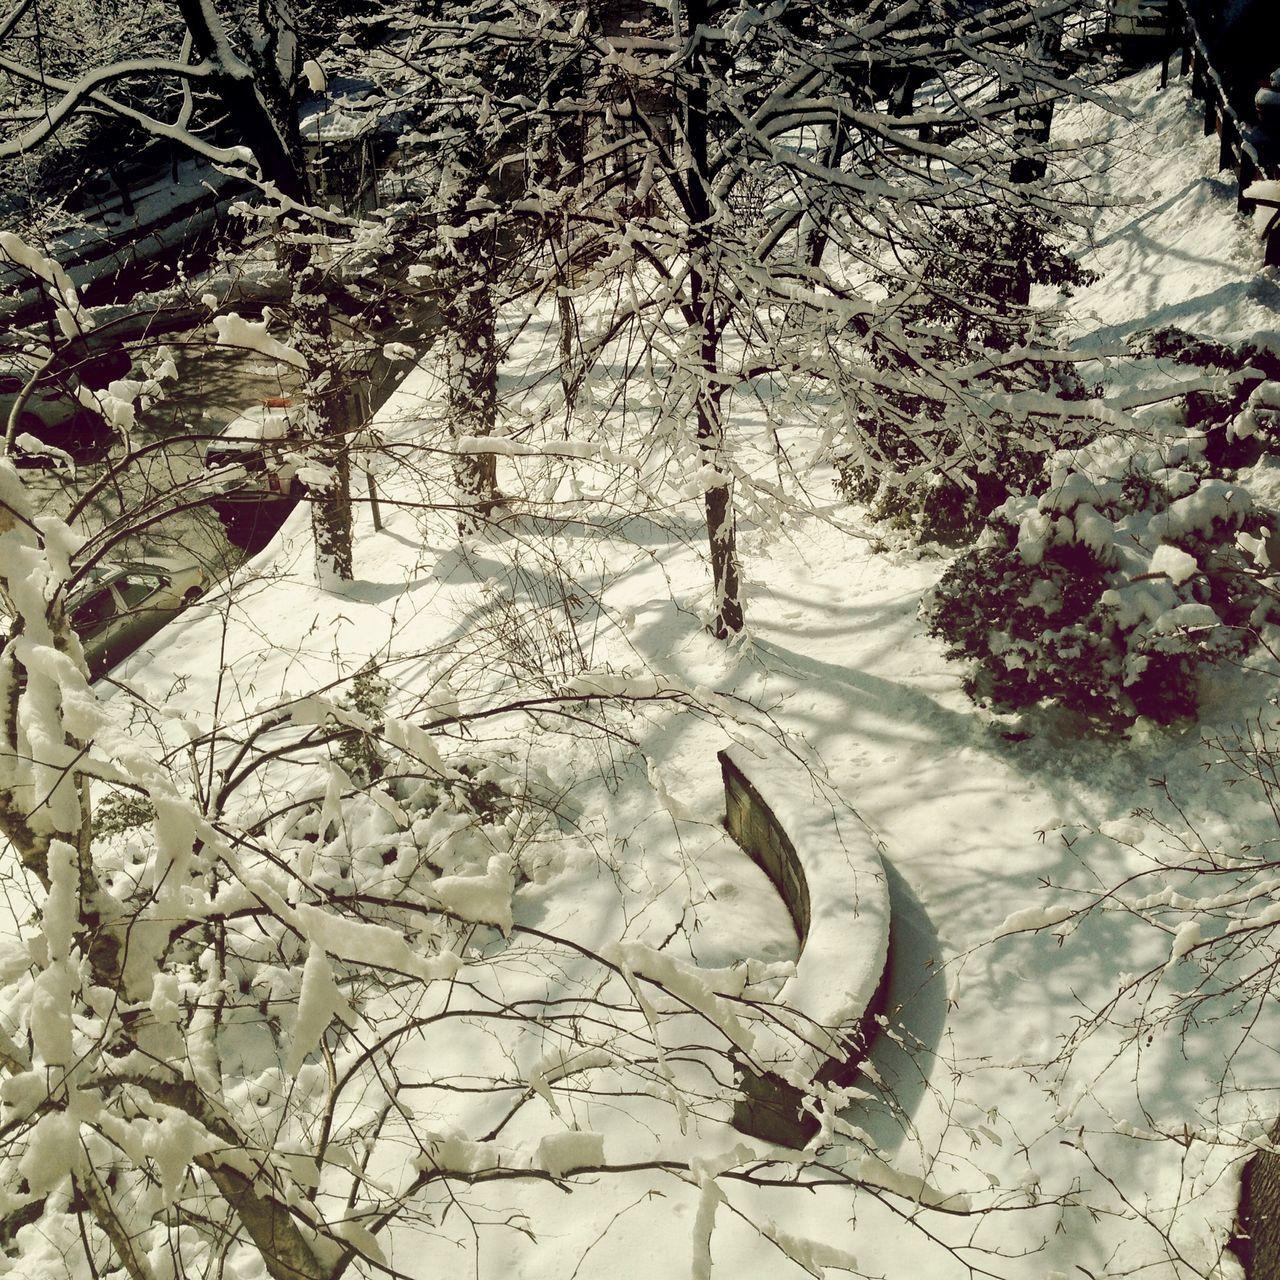 View from the window of my classroom... Winter wonderland!!! Cheers!!! EyeEm Best Shots Winter Hello World Winter Wonderland